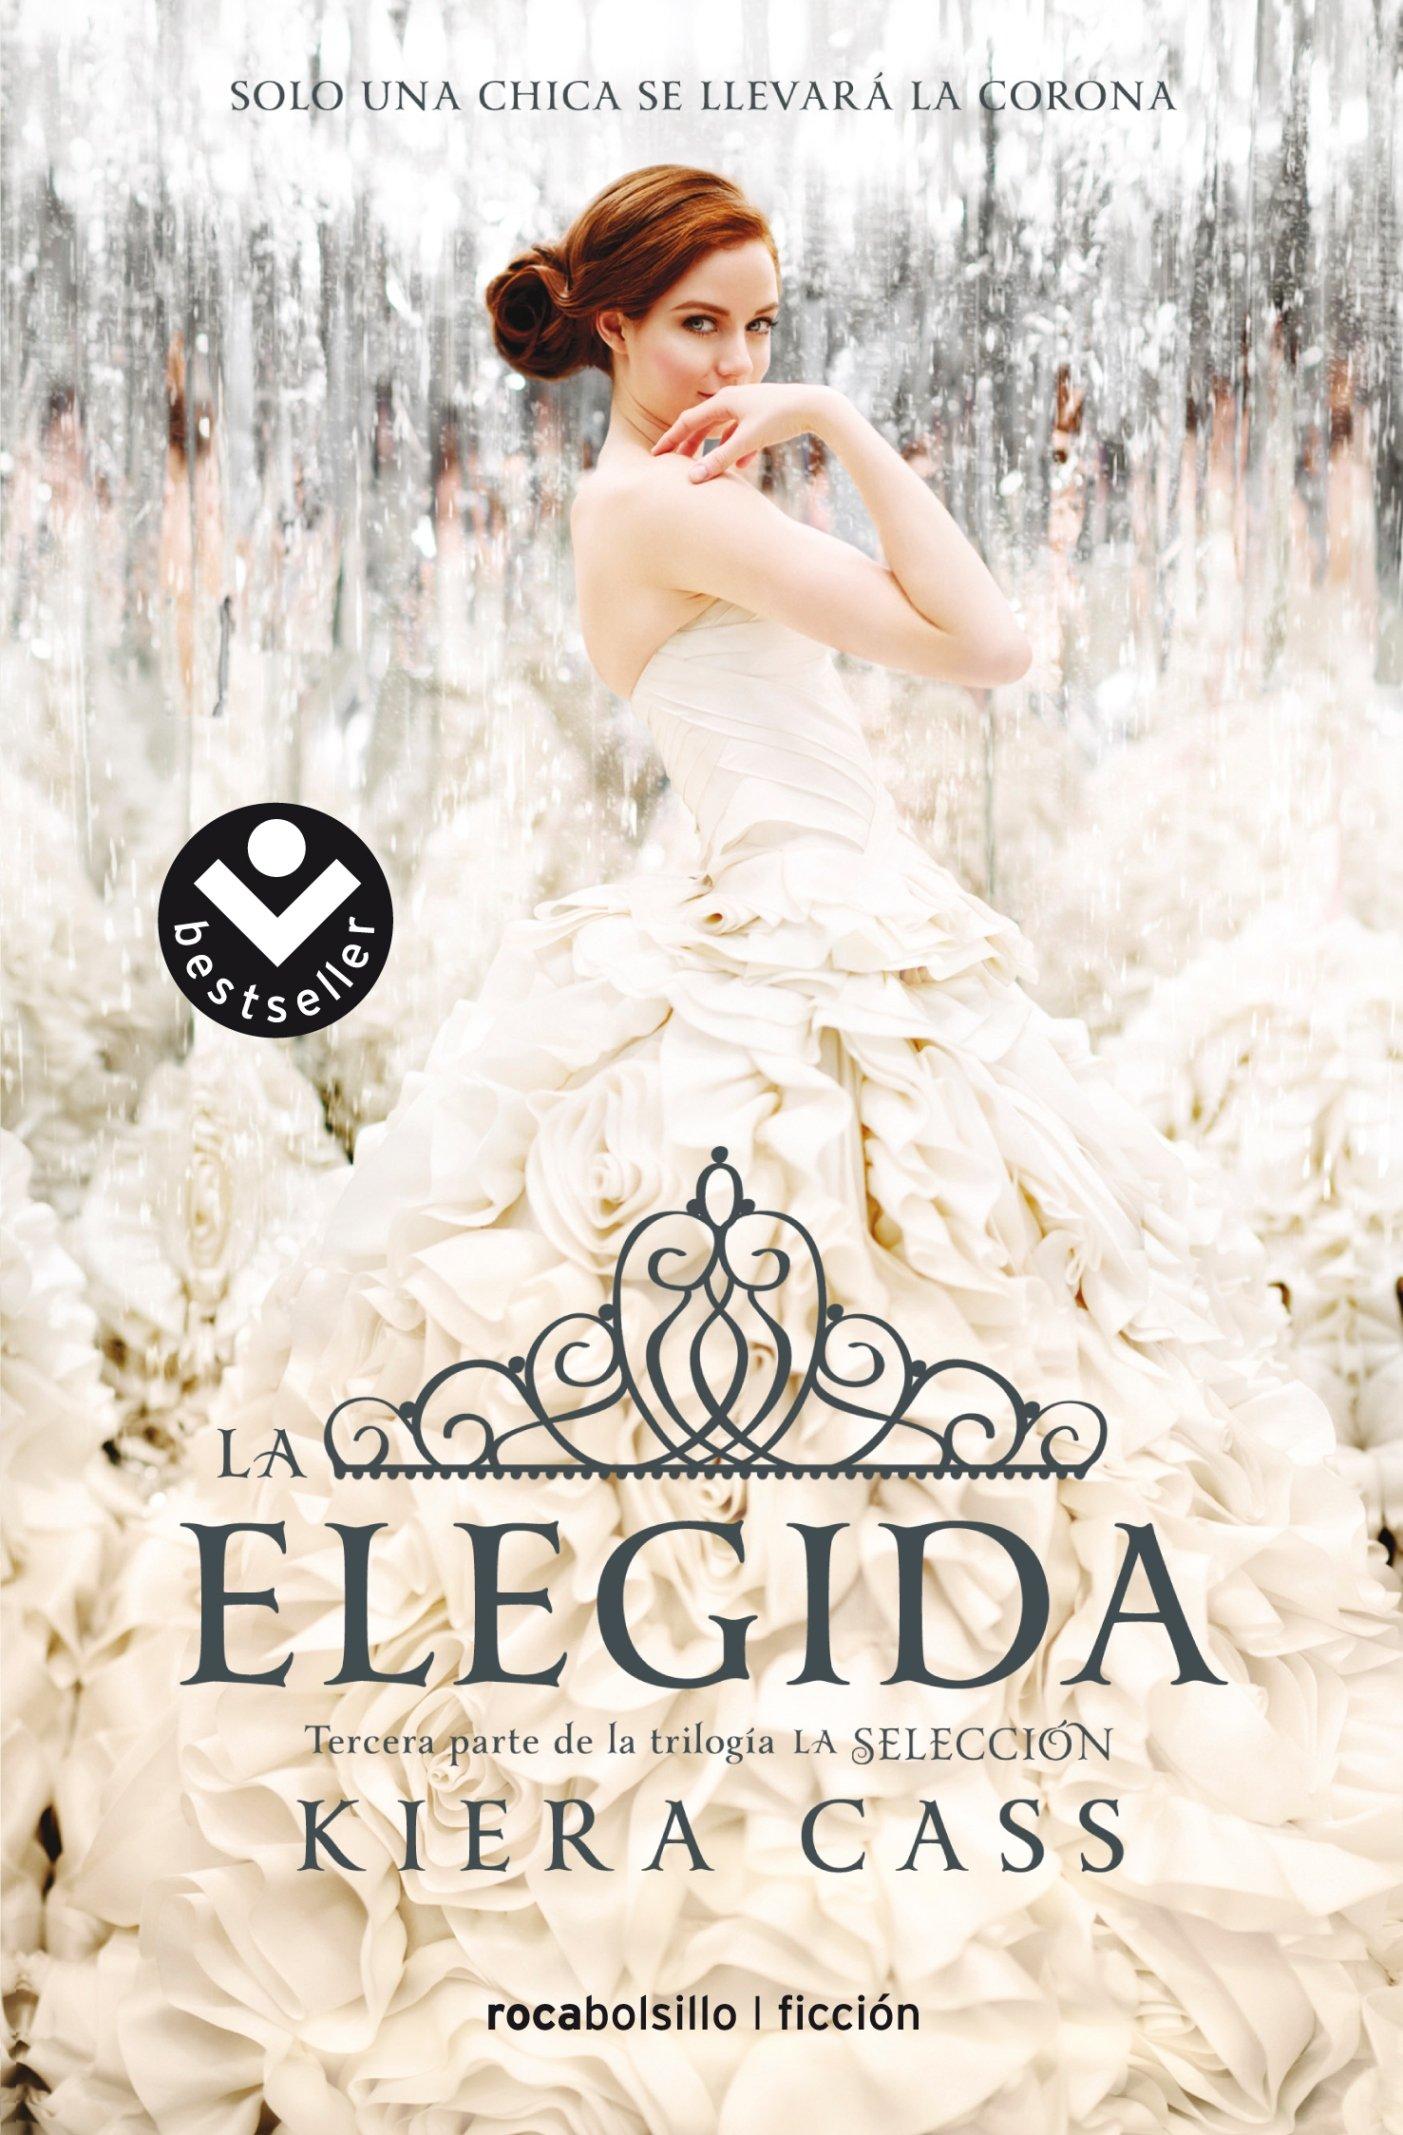 Elegida Spanish Kiera Cass product image